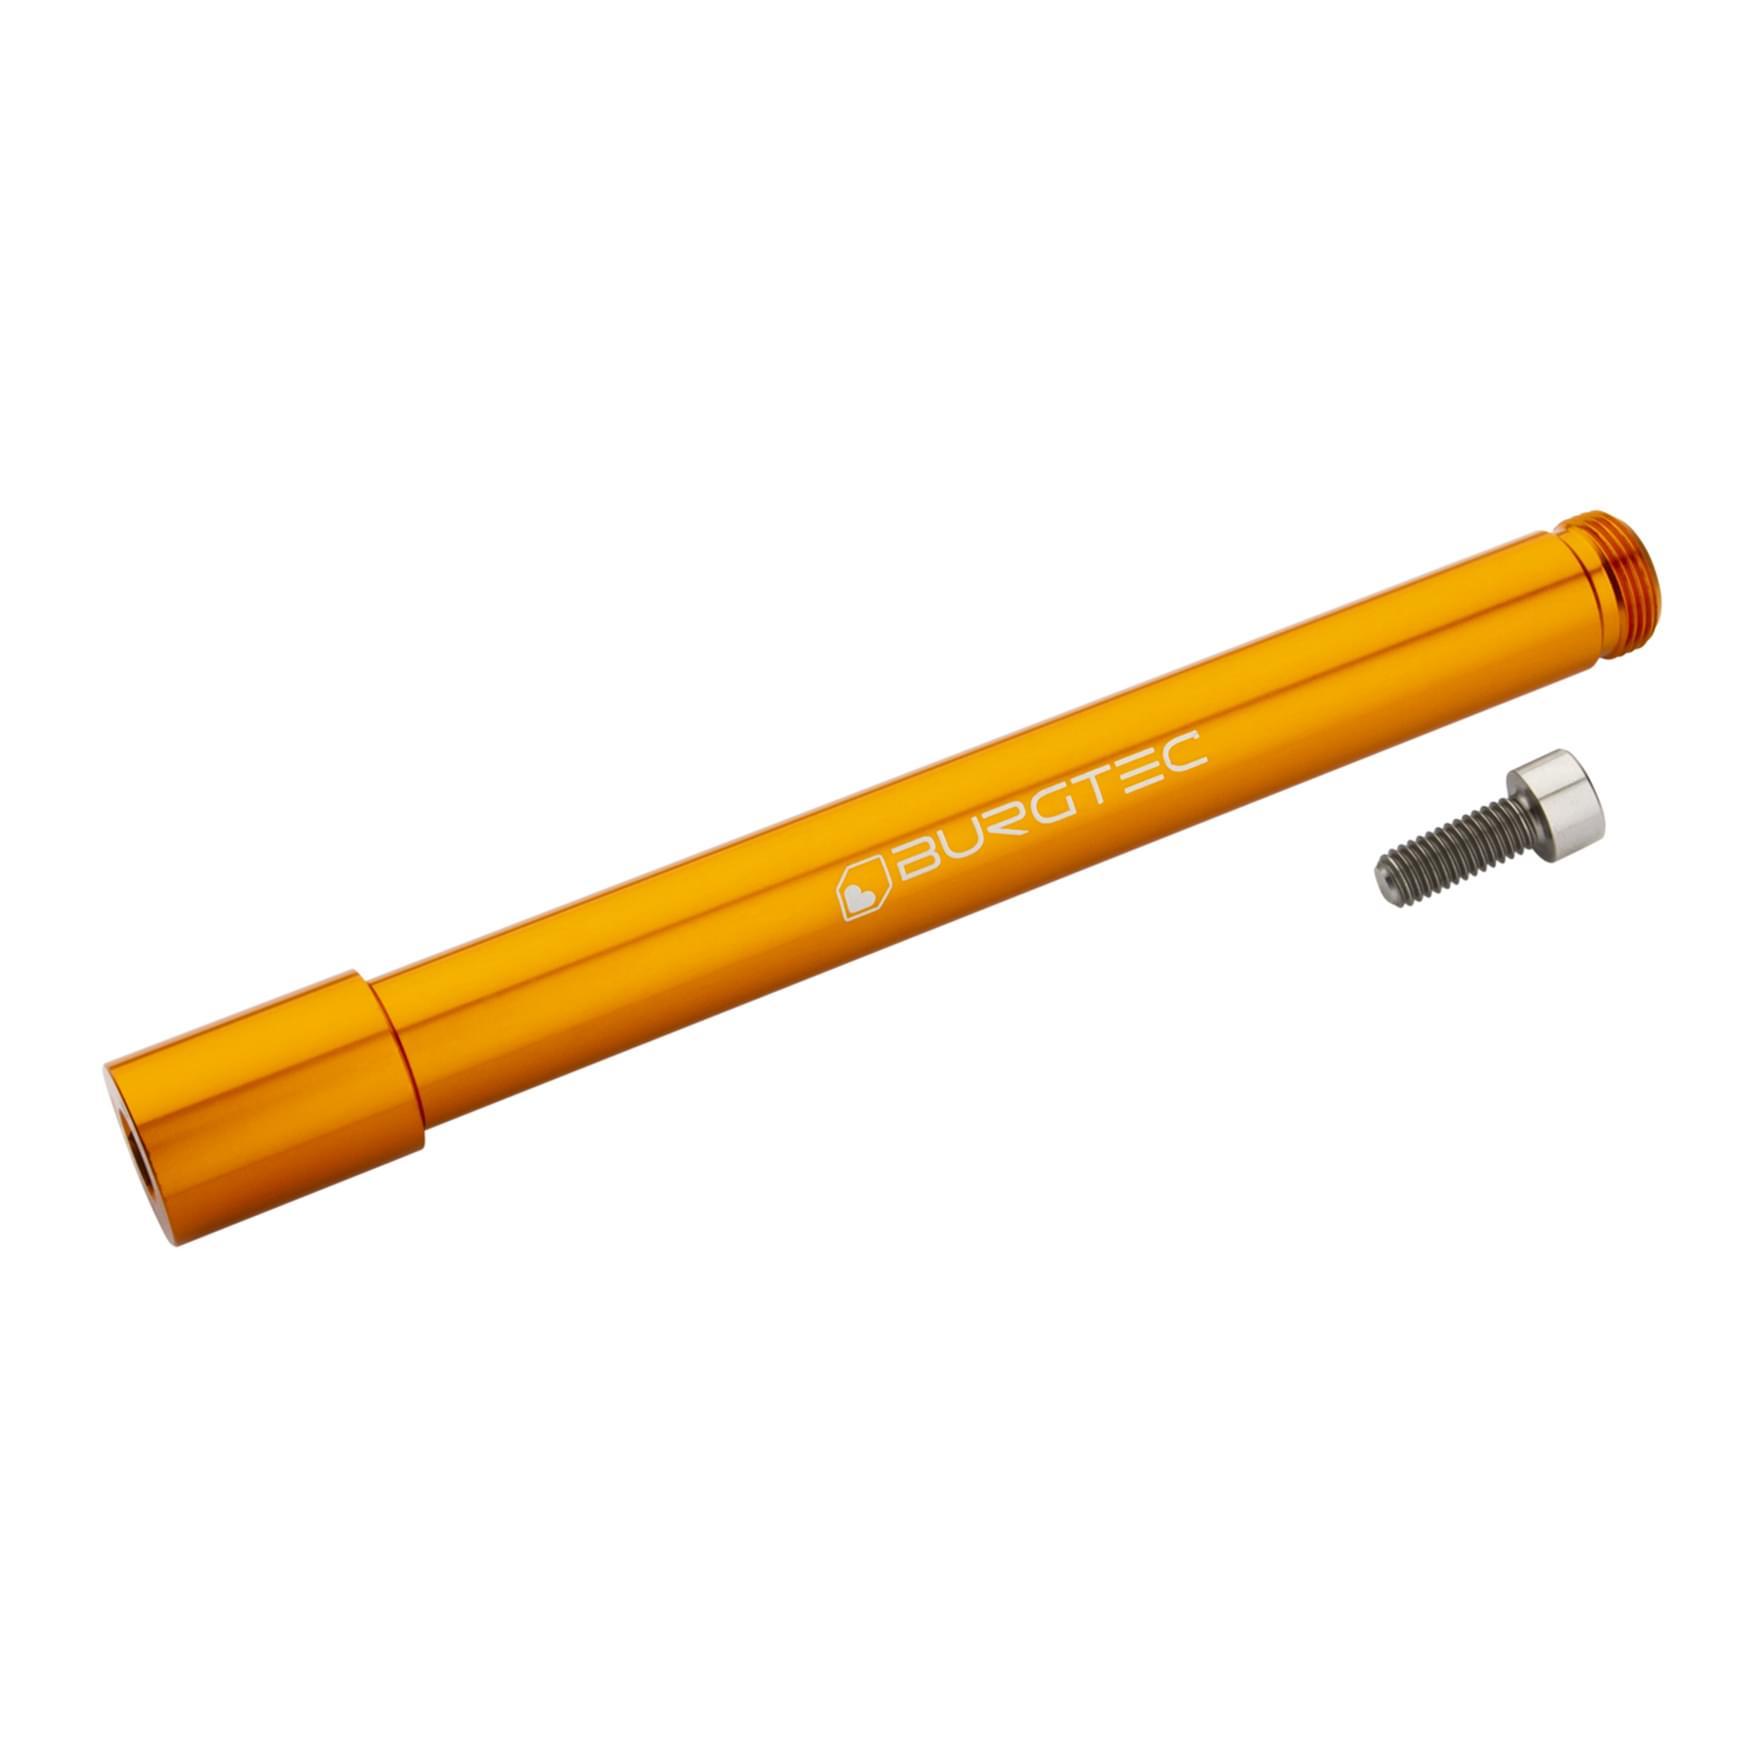 Burgtec Öhlins Boost Fork Axle Iron Bro Orange